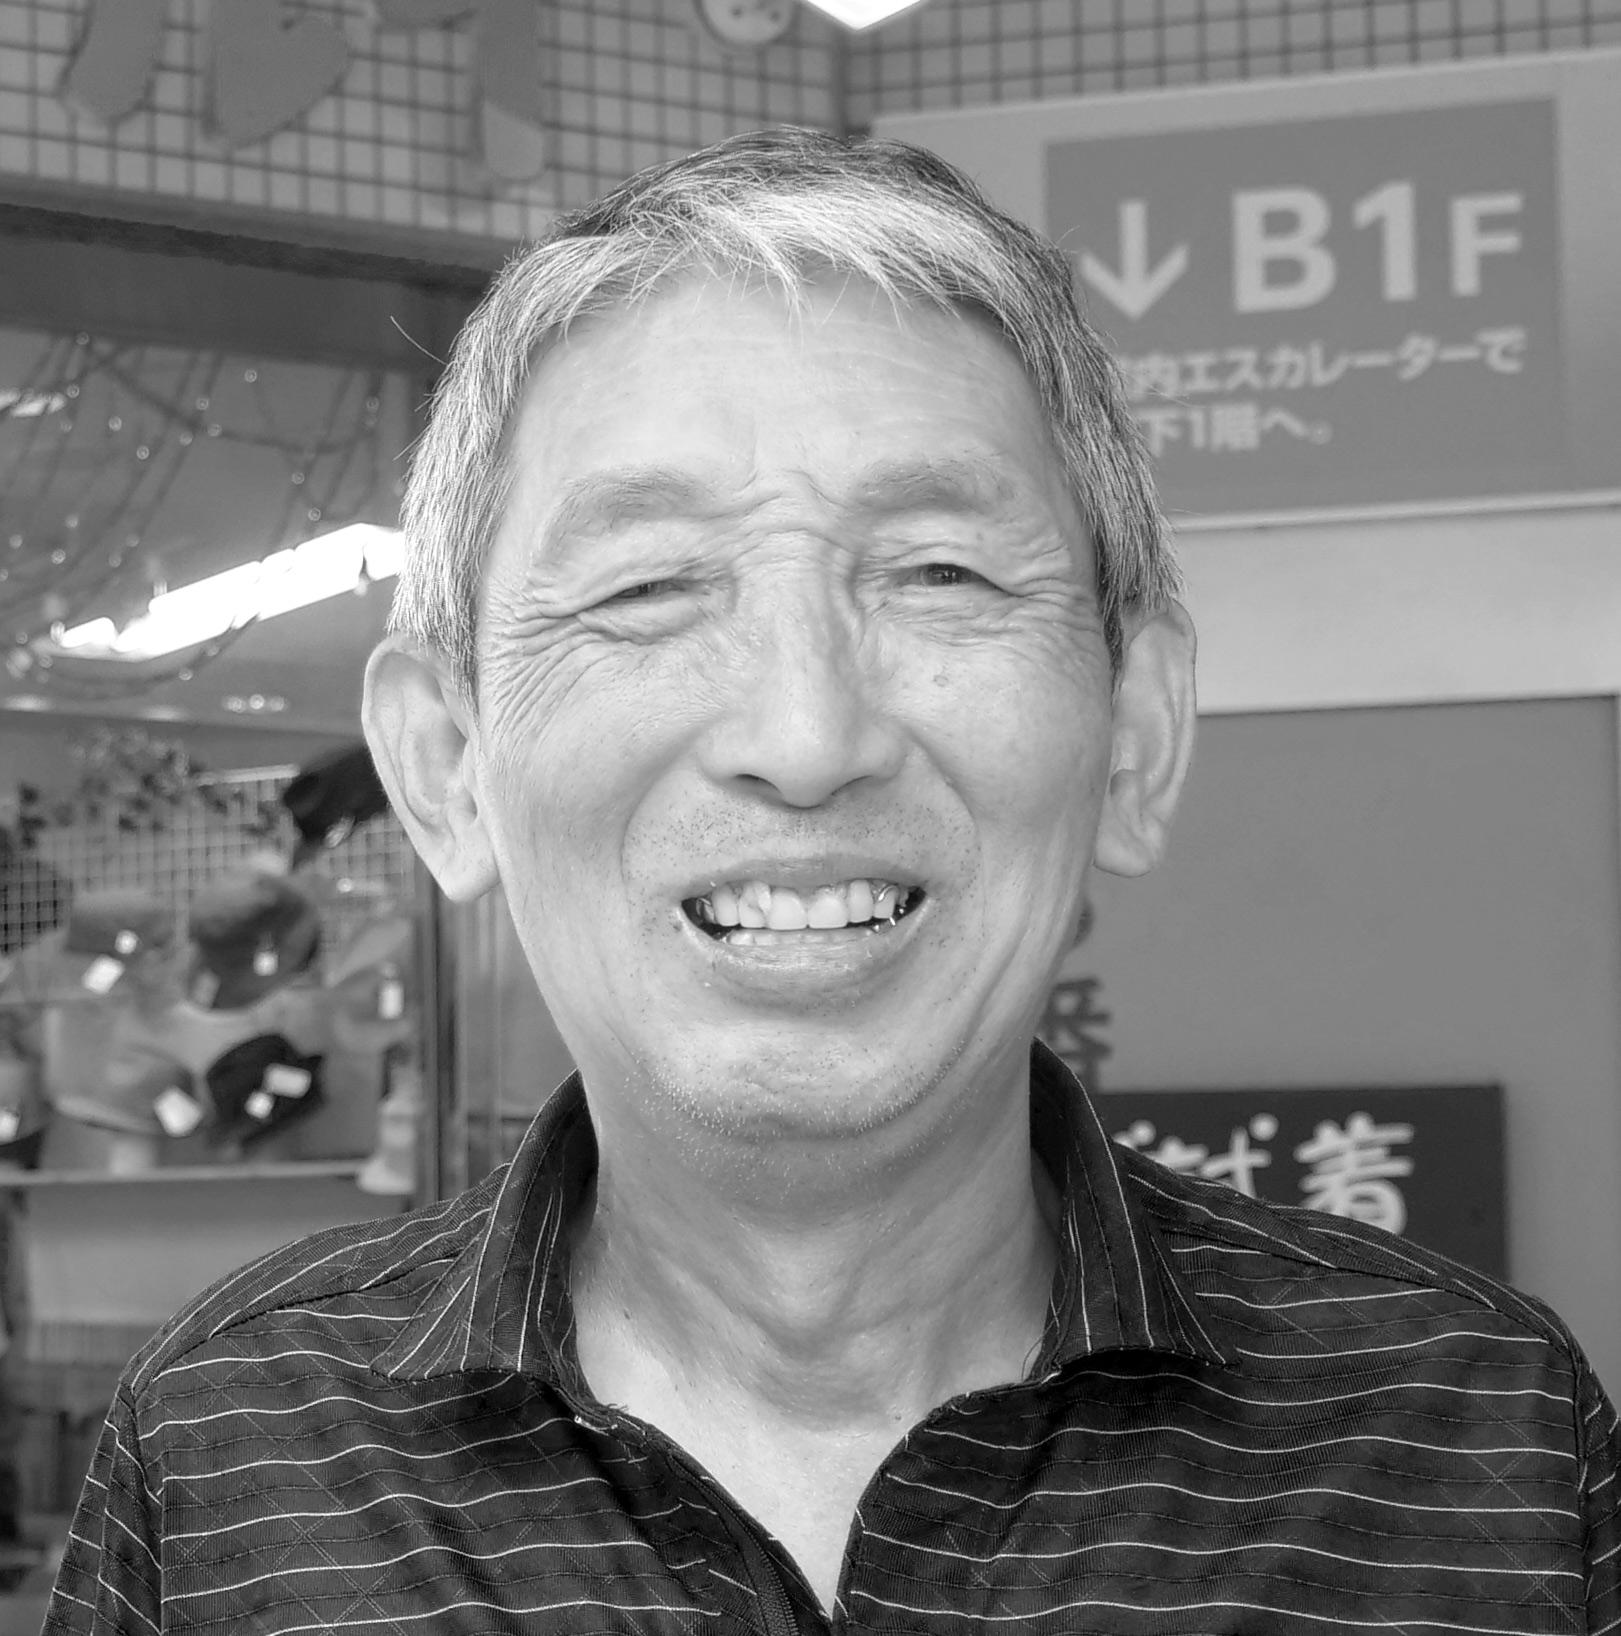 YOSHIAKI IMAI